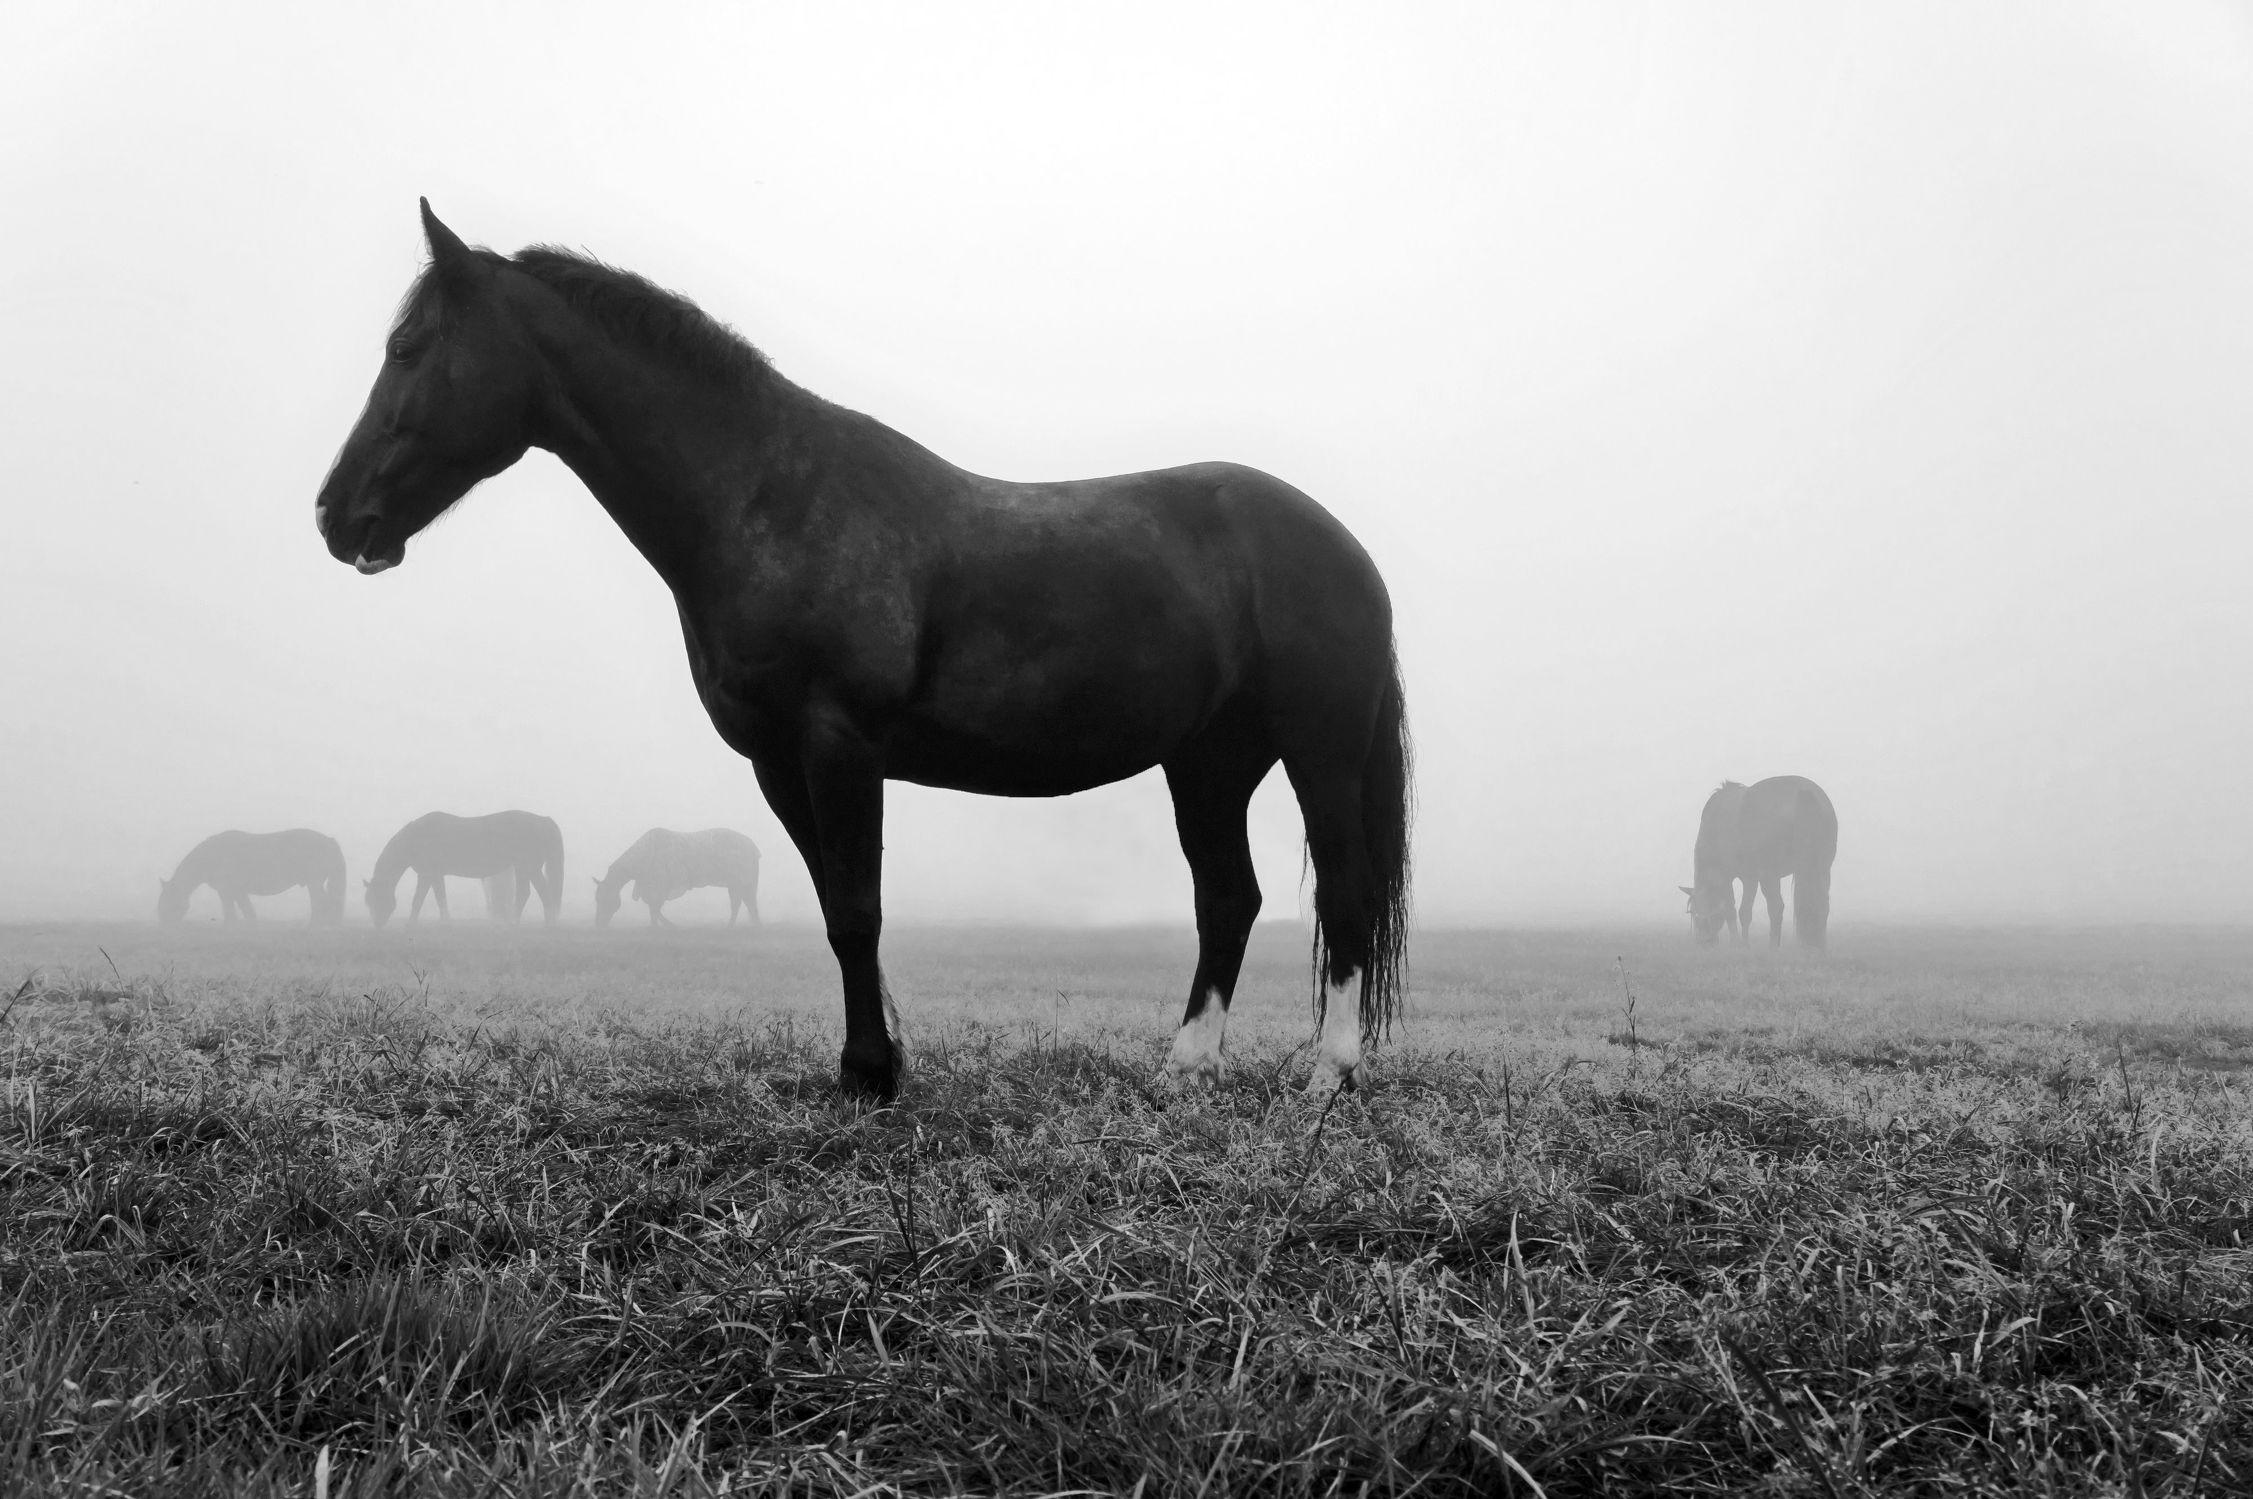 Bild mit Tiere, Tiere, Nebel, Pferde, Pferde, Tier, Tier, Kinderbild, Kinderbilder, Pferd, Pferd, Weide, schwarz weiß, mystisch, reiten, SW, Pferdeliebe, pferdebilder, pferdebild